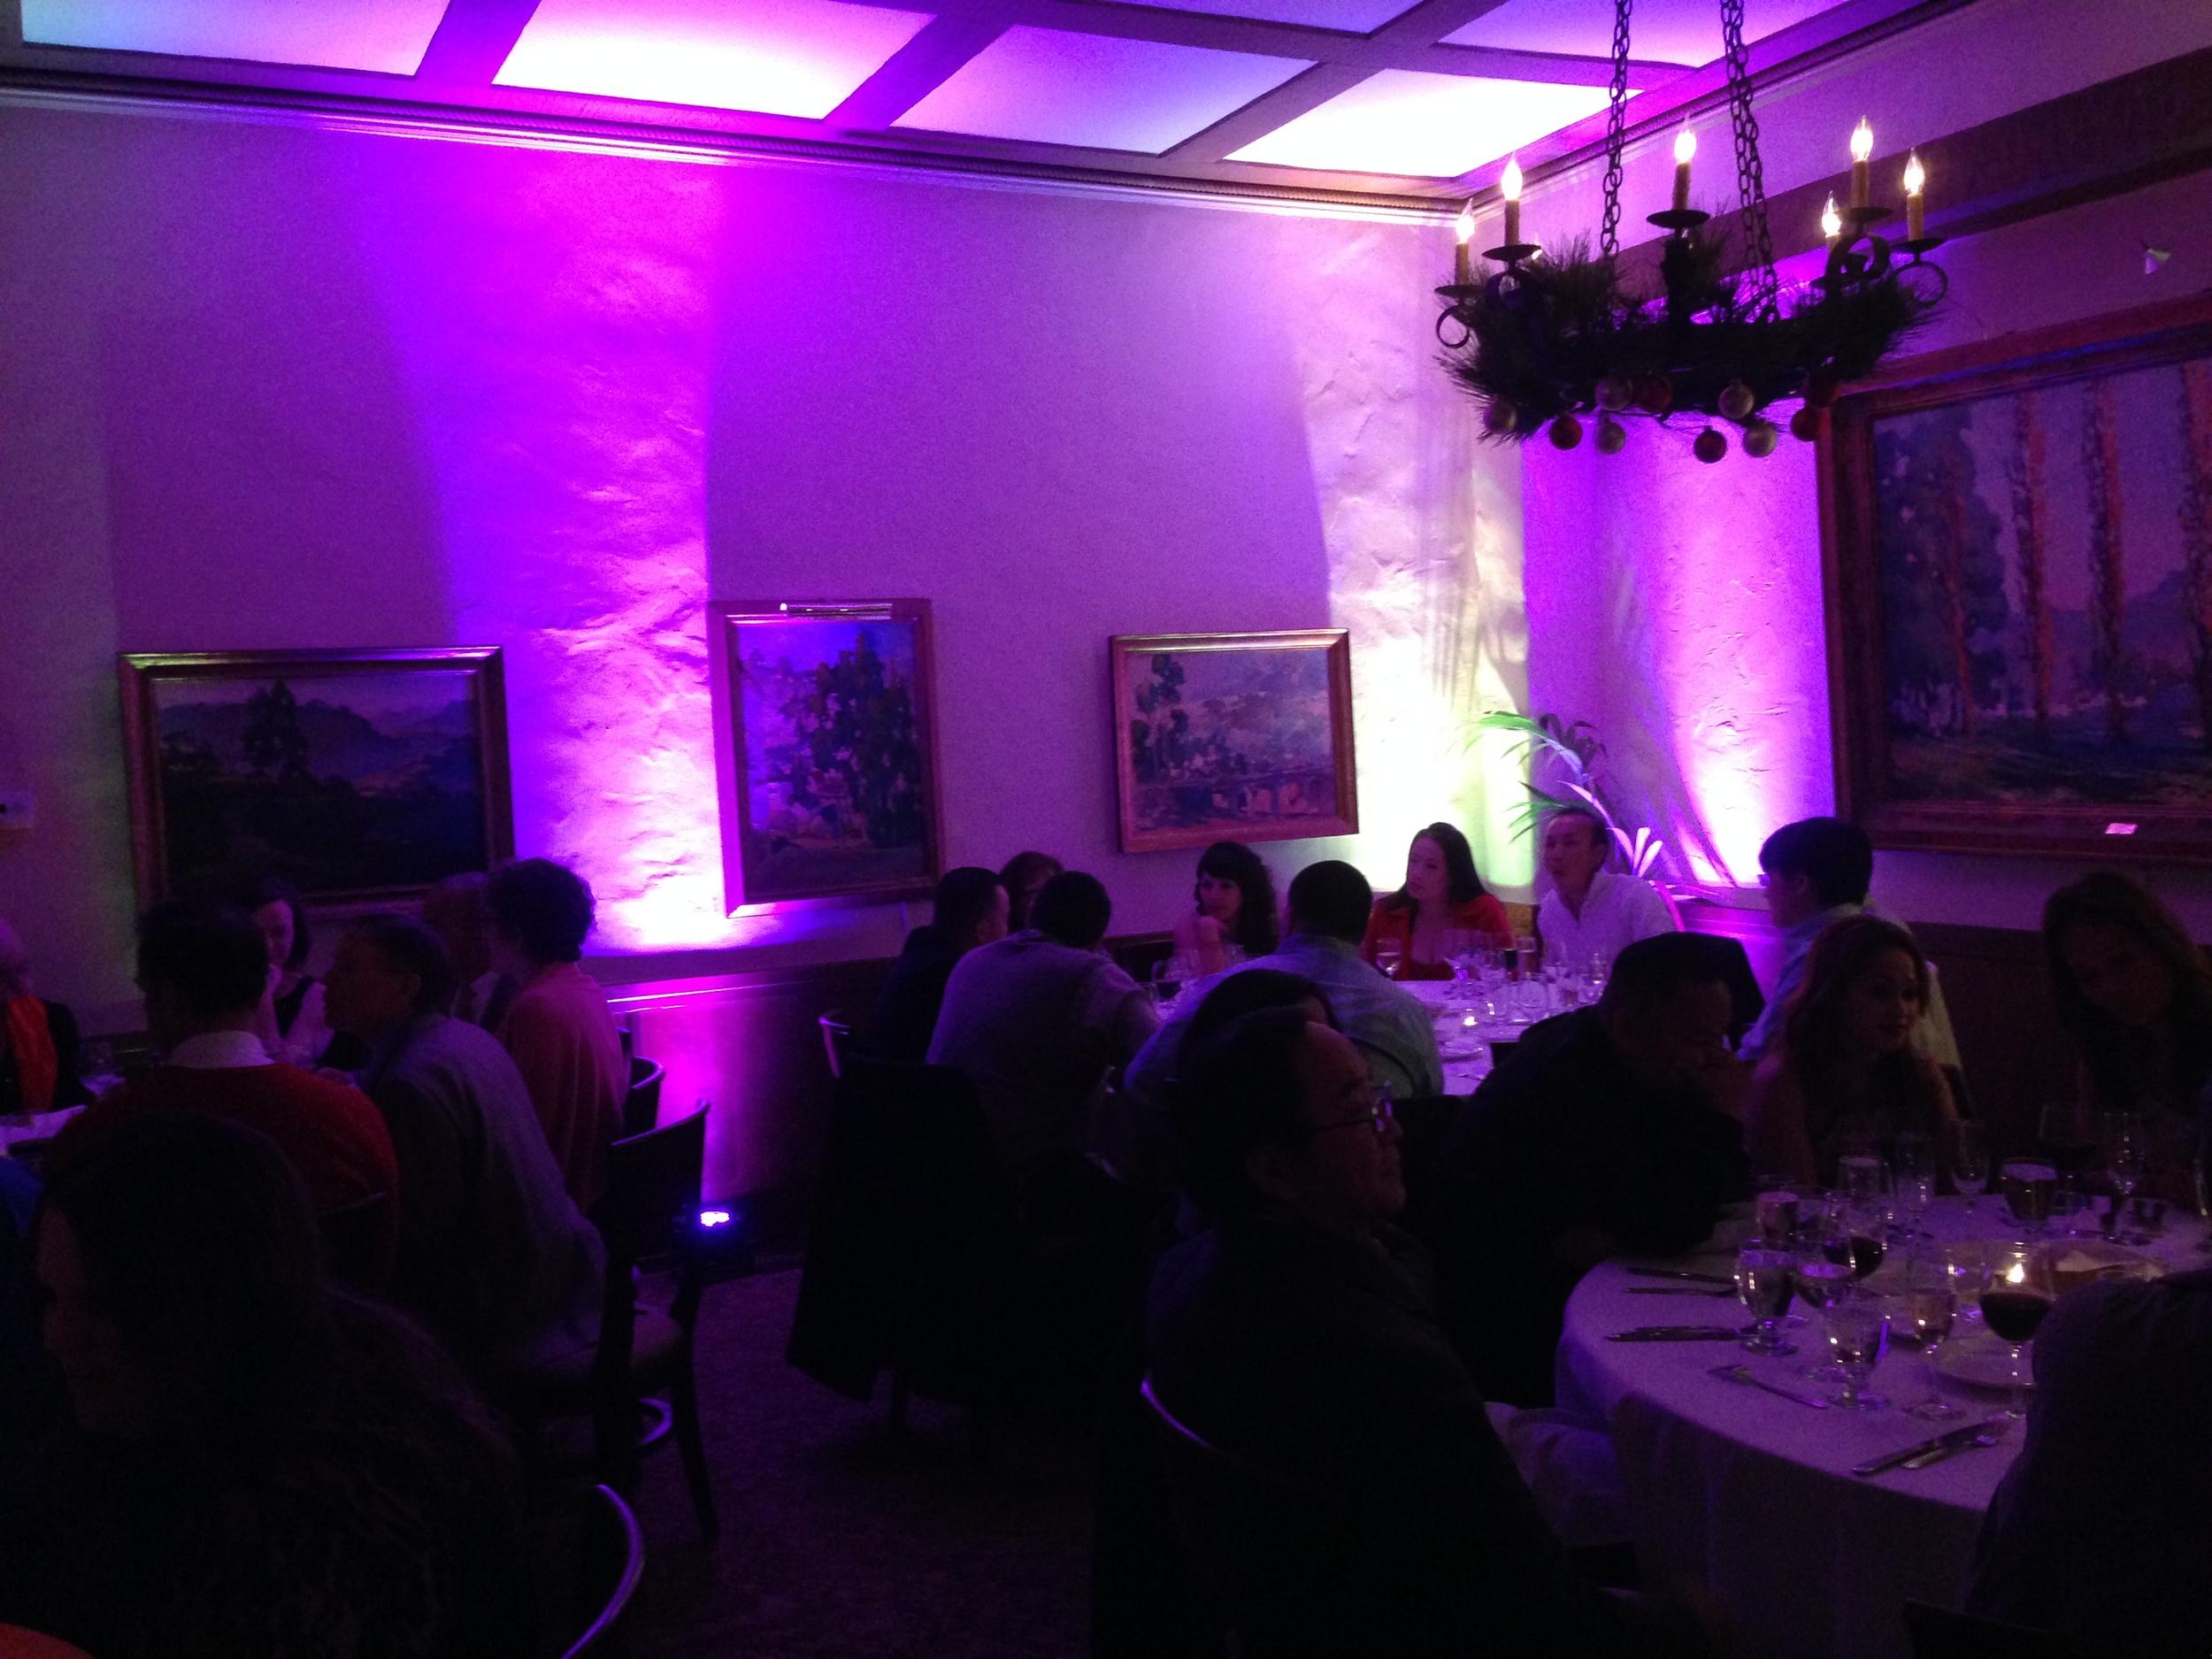 Santa Barbara Wedding DJs Event Lighting : Full lighting design house, uplighting, uplights, professional lighting